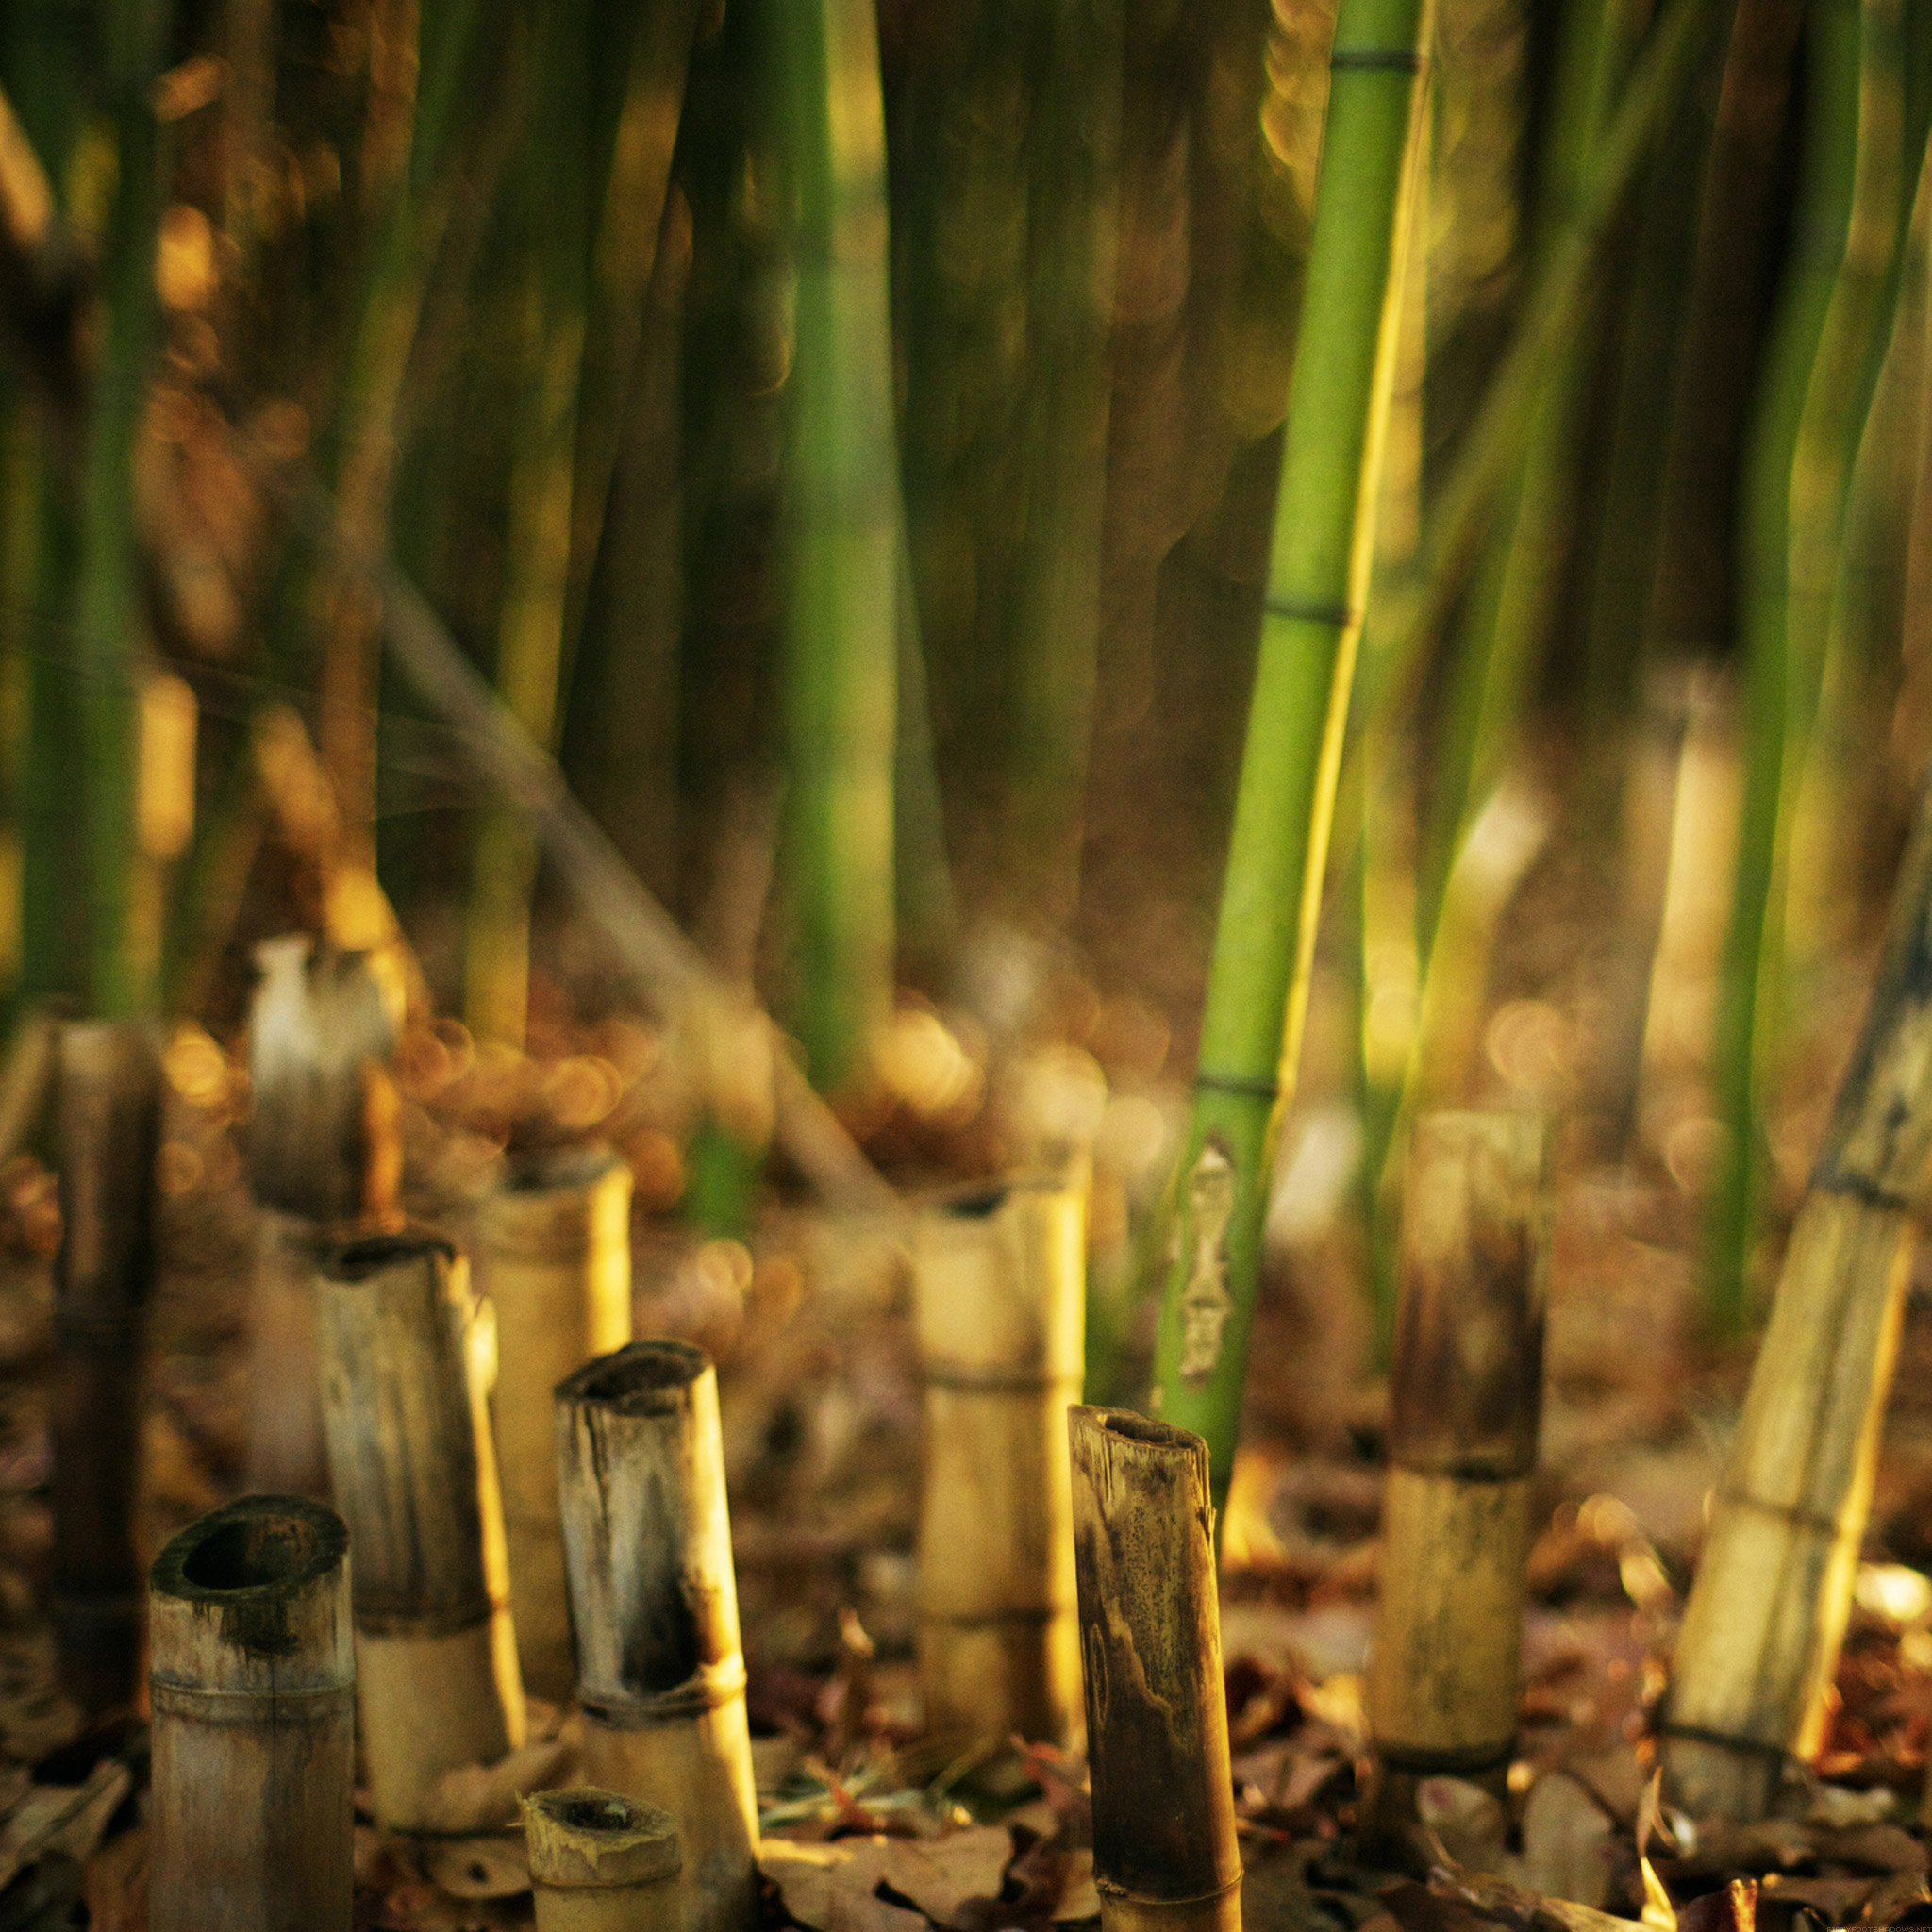 Bamboo-3Wallpapers-iPad-Retina